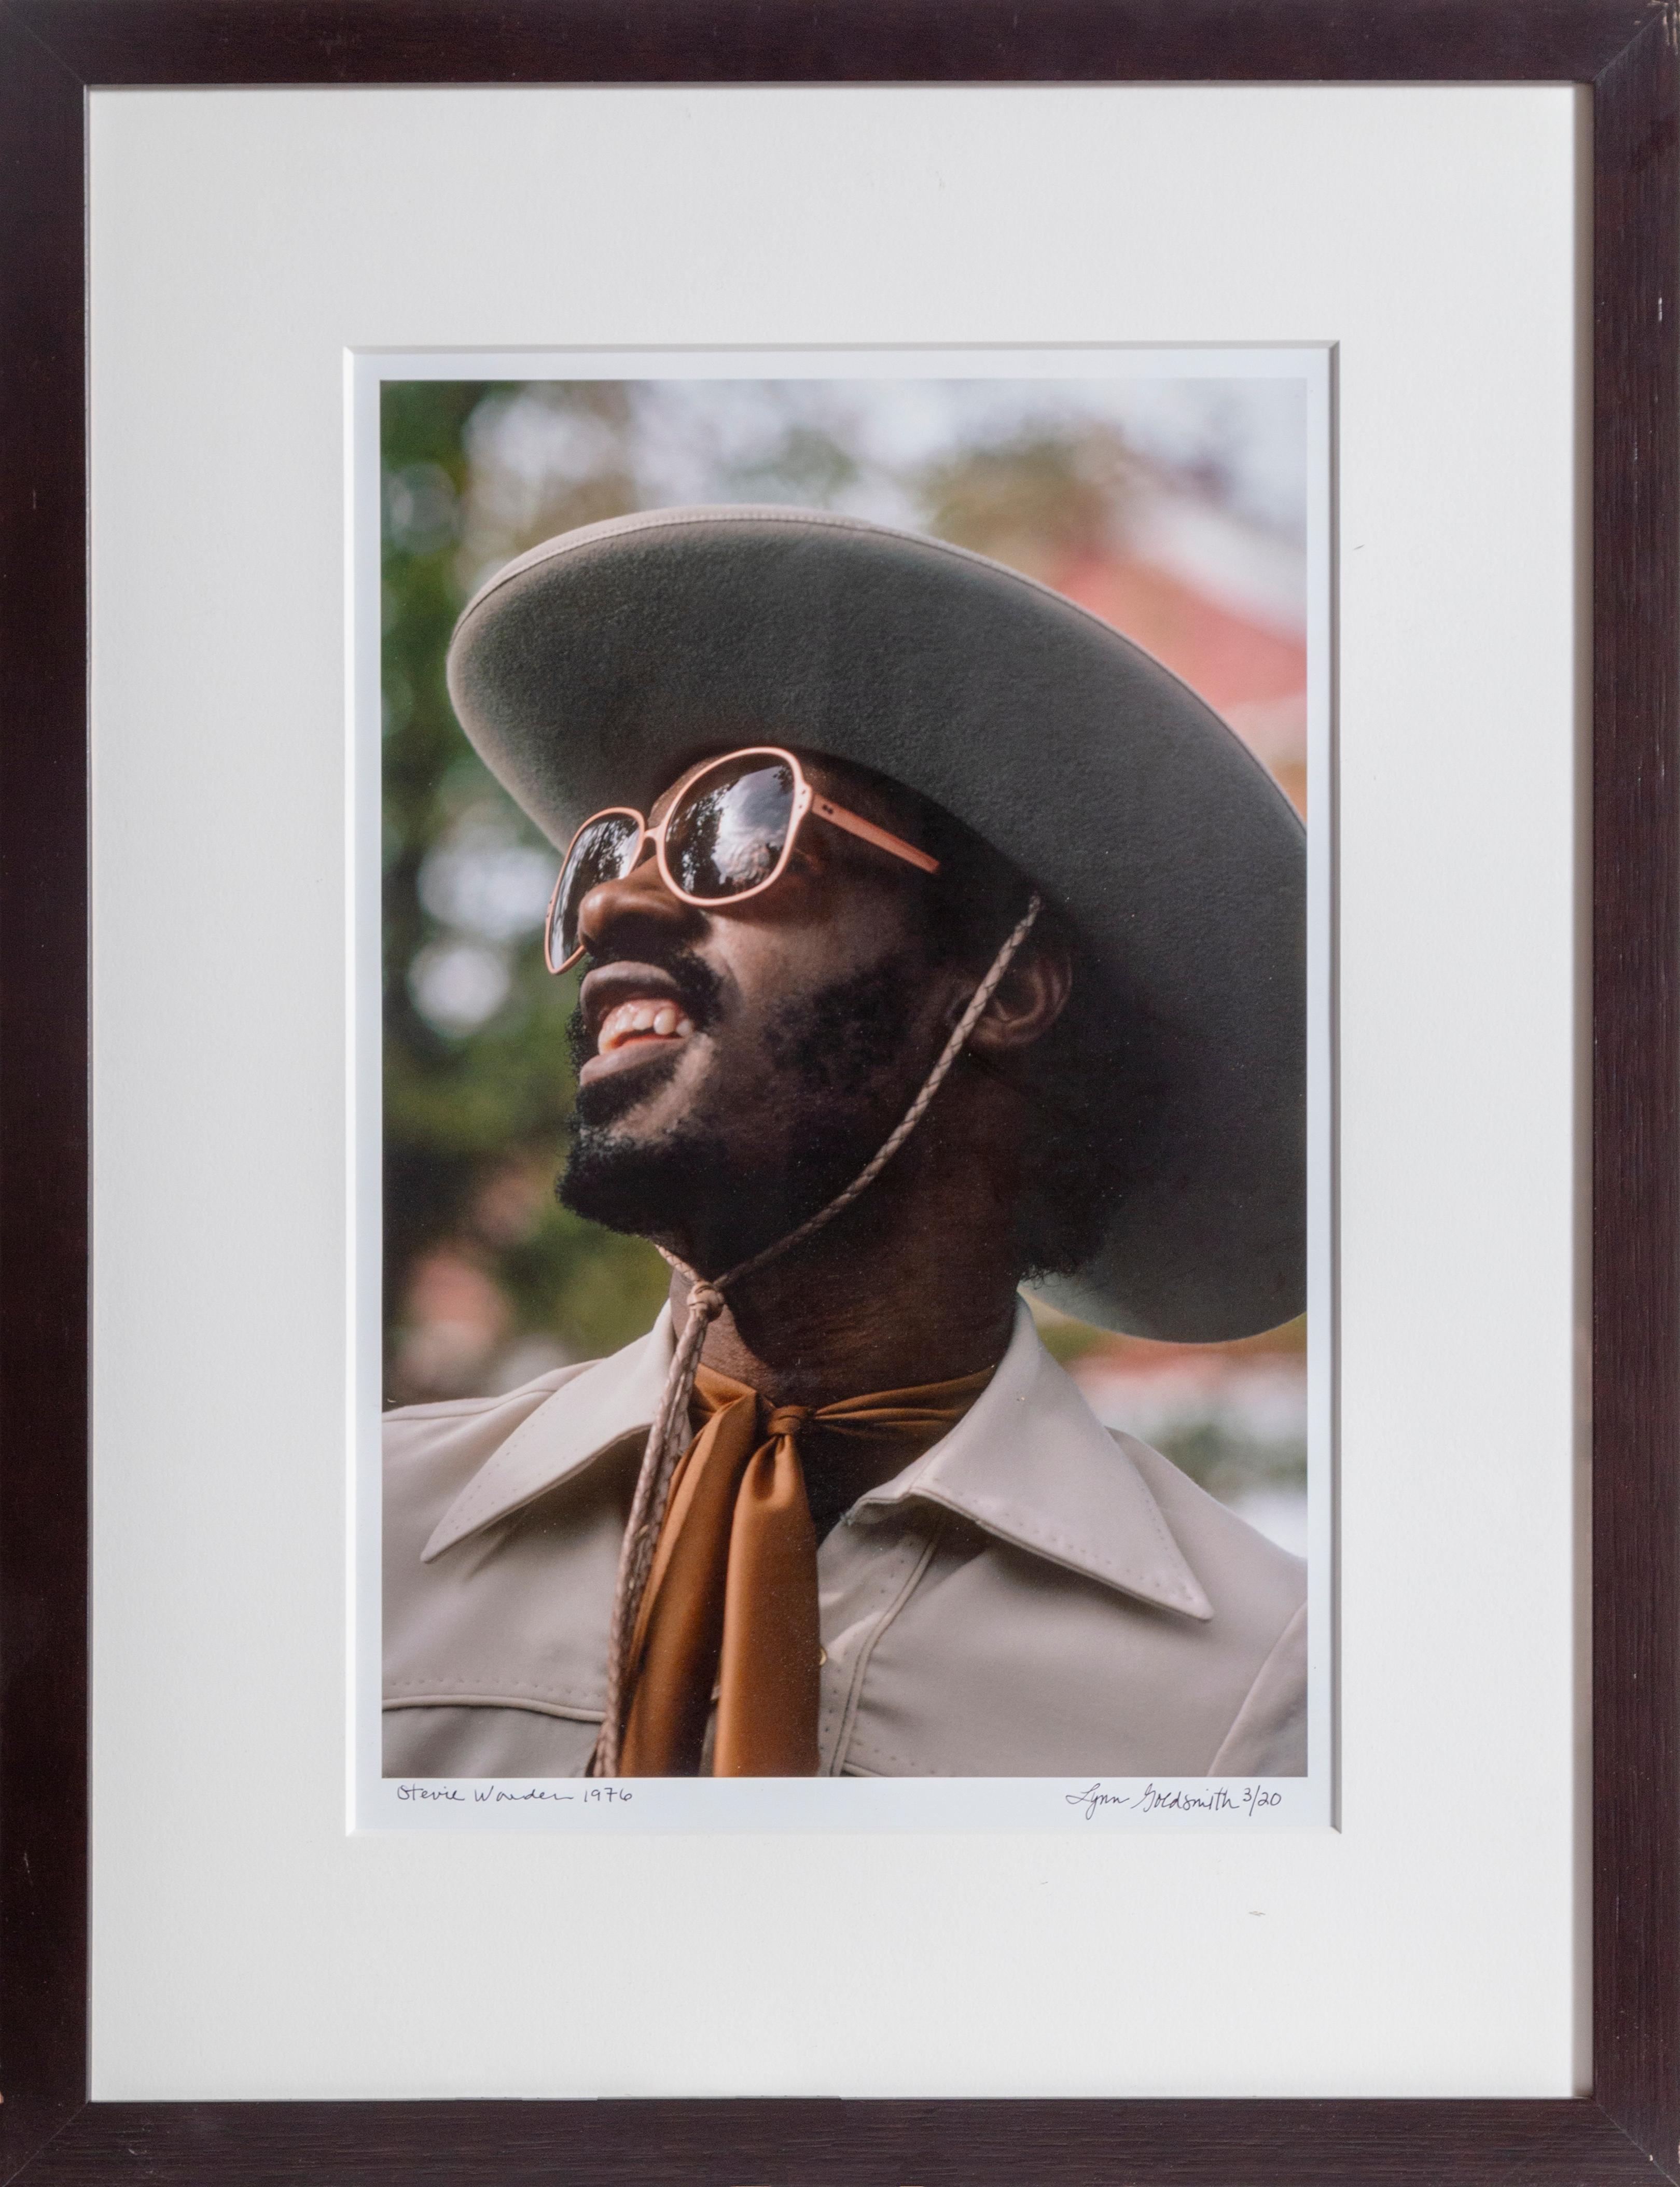 Stevie Wonder Photograph, by Lynn Goldsmith